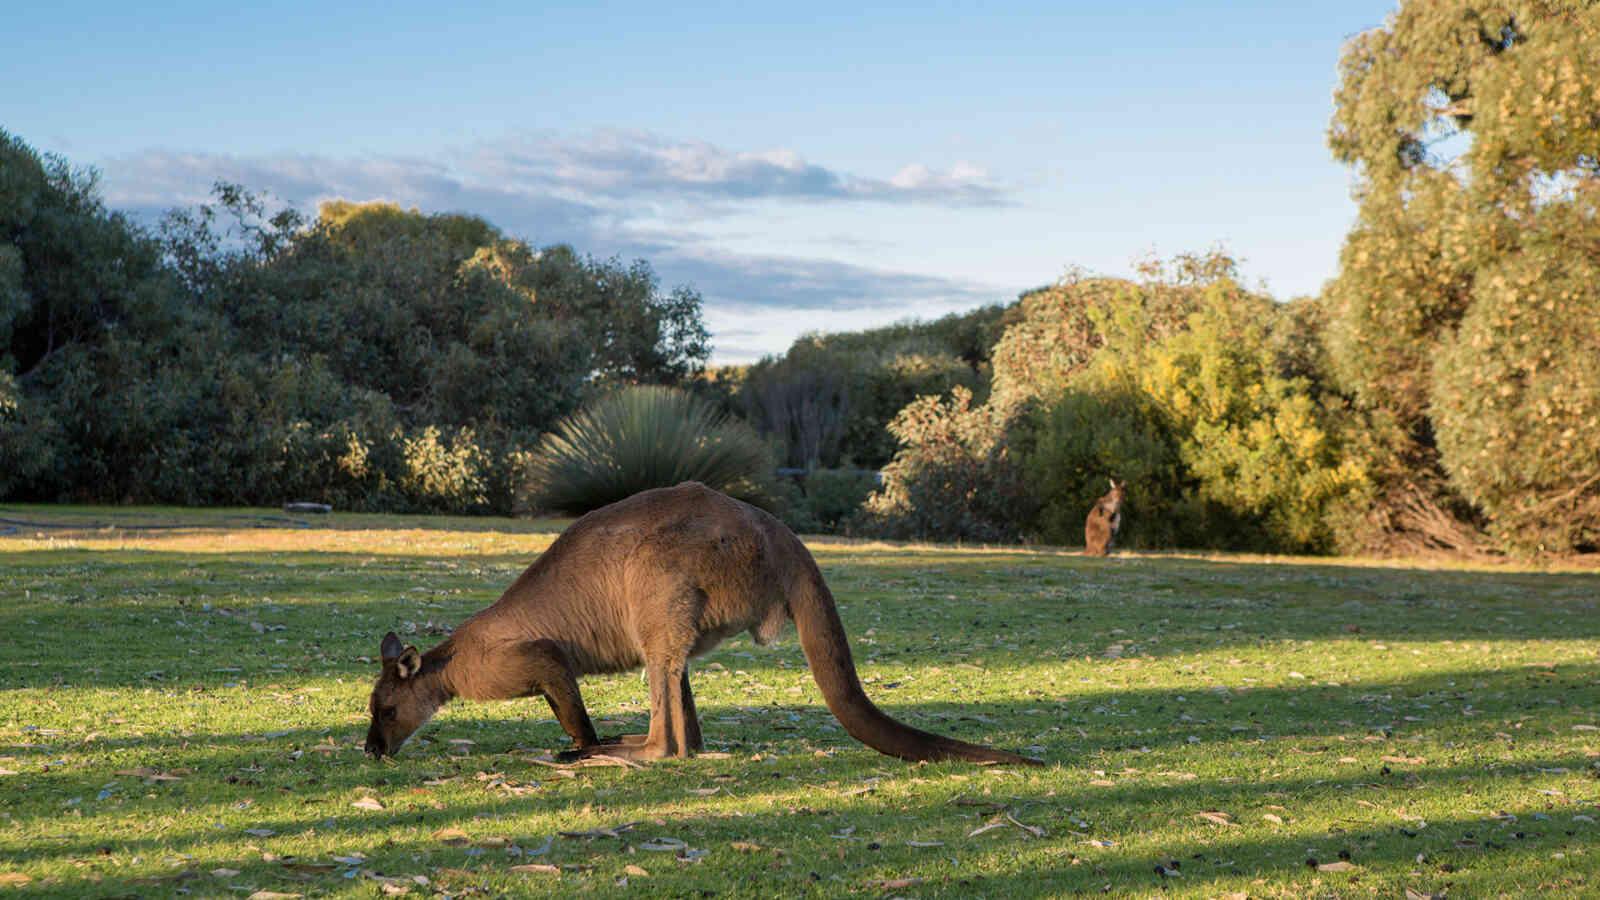 Kangaroo Island Kangaroo 1920X1200Px